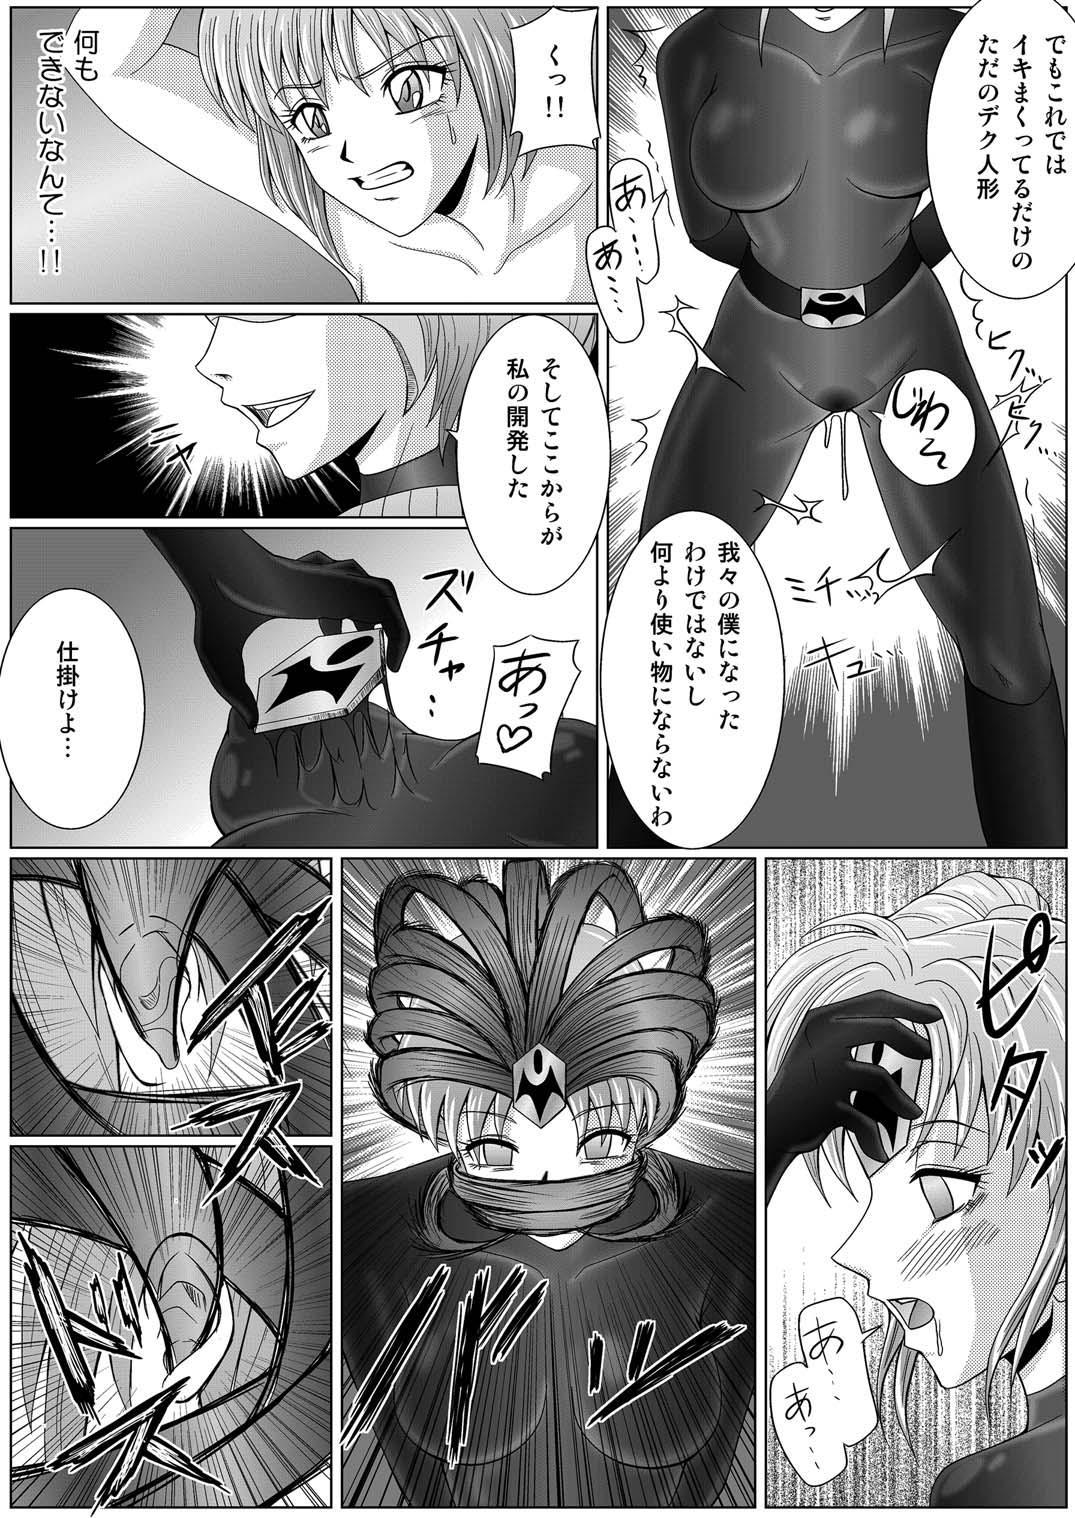 [Macxe's (monmon)] Tokubousentai Dinaranger ~Heroine Kairaku Sennou Keikaku~ Vol.01/02/03 (Renkaban) [Digital] 24